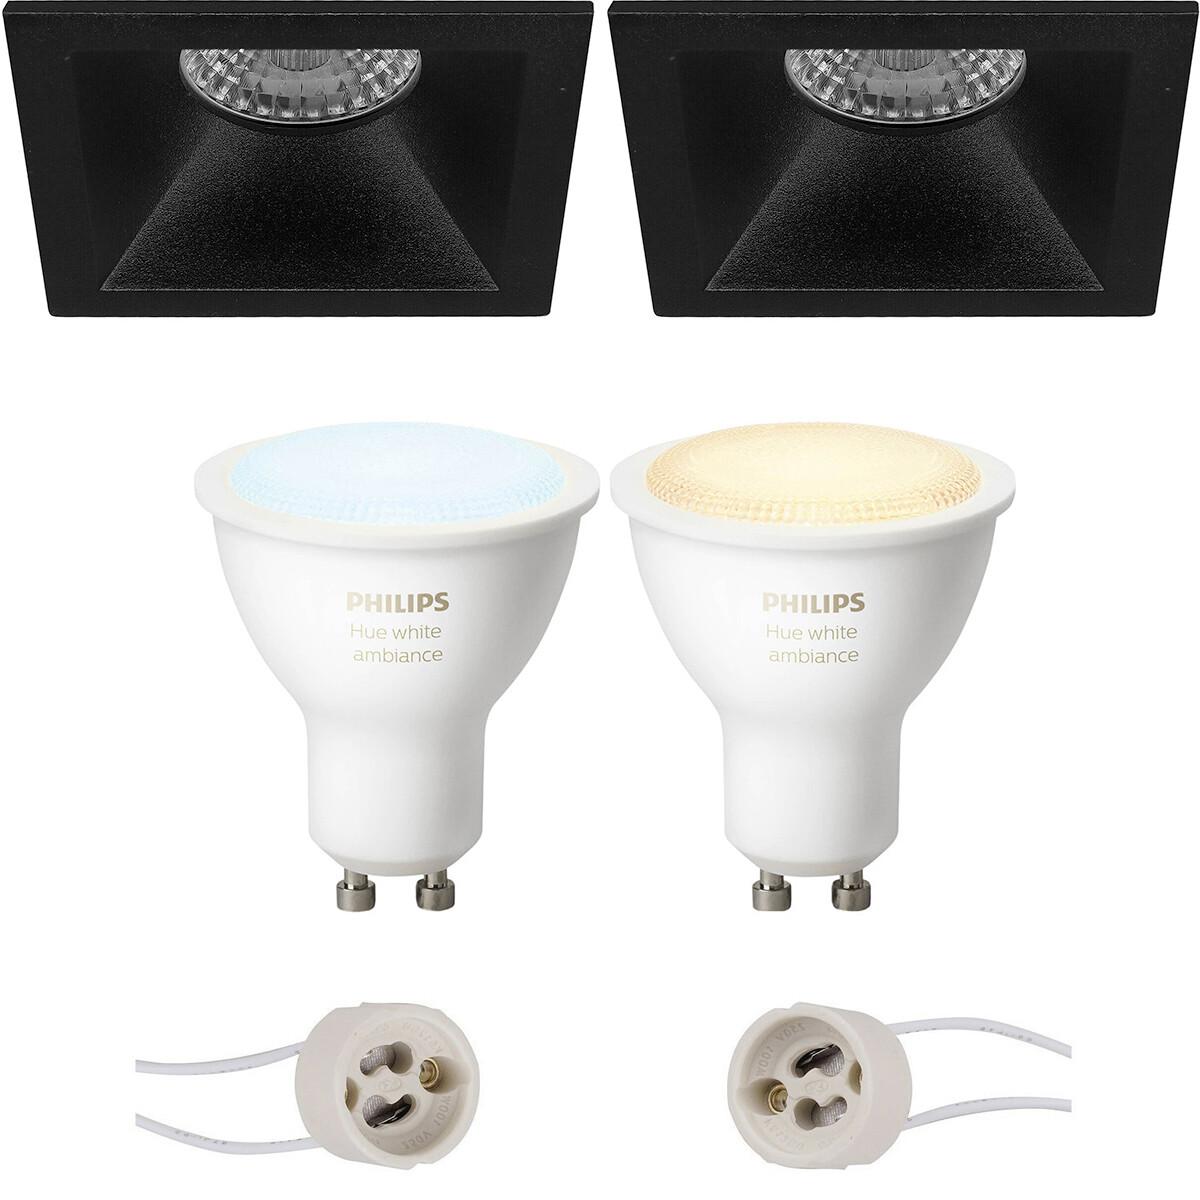 Pragmi Pollon Pro - Inbouw Vierkant - Mat Zwart - Verdiept - 82mm - Philips Hue - LED Spot Set GU10